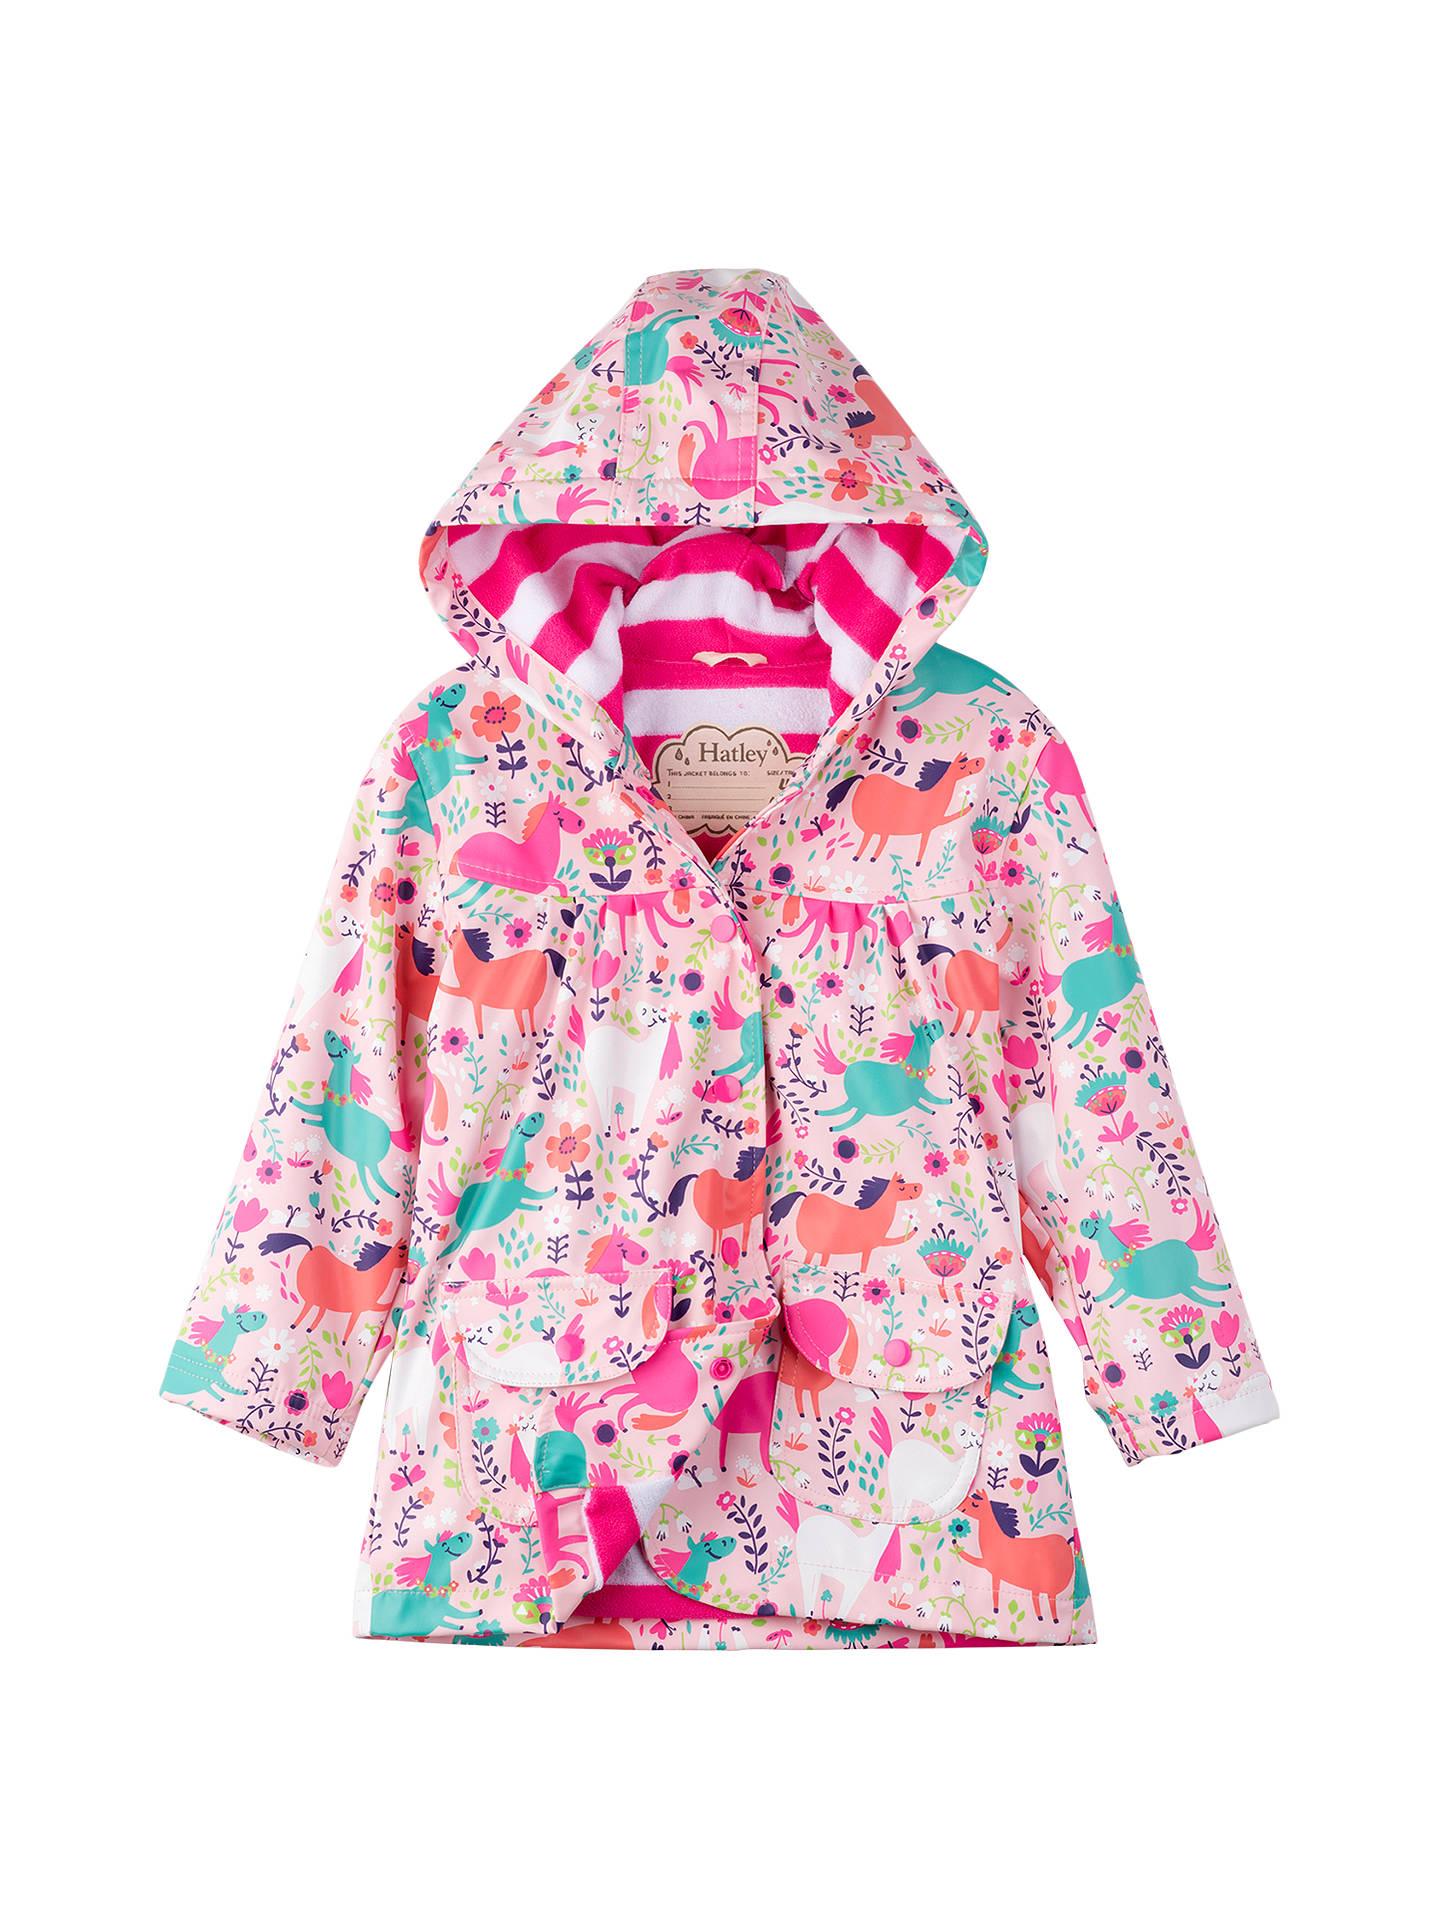 b67b15462 Hatley Girls  Roaming Horses Raincoat